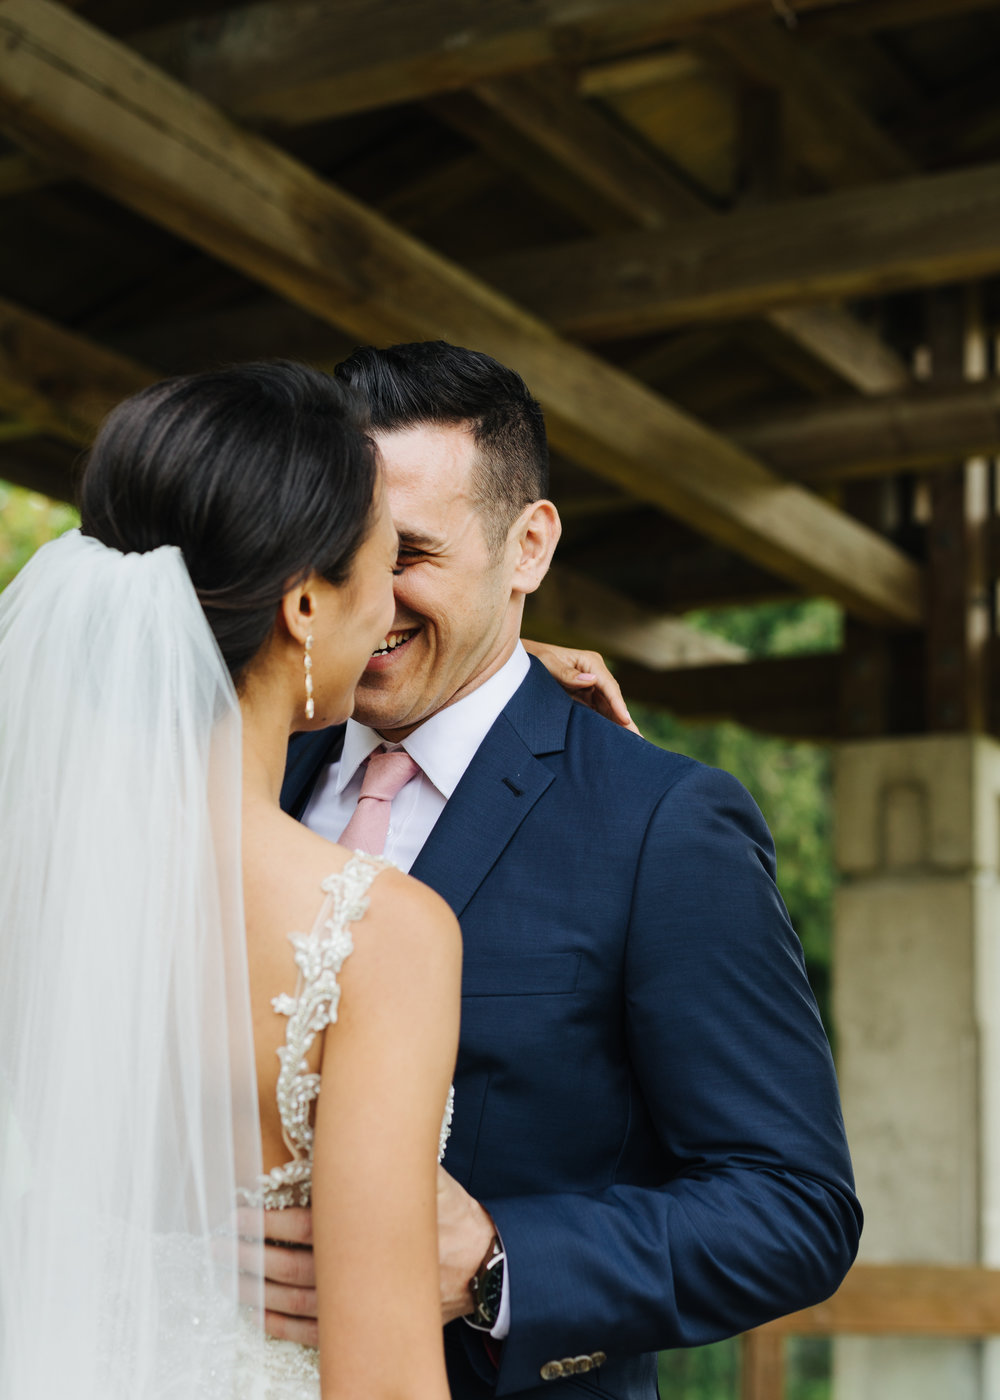 herafilms_wedding_jayne_connor_hera_selects-35.jpg